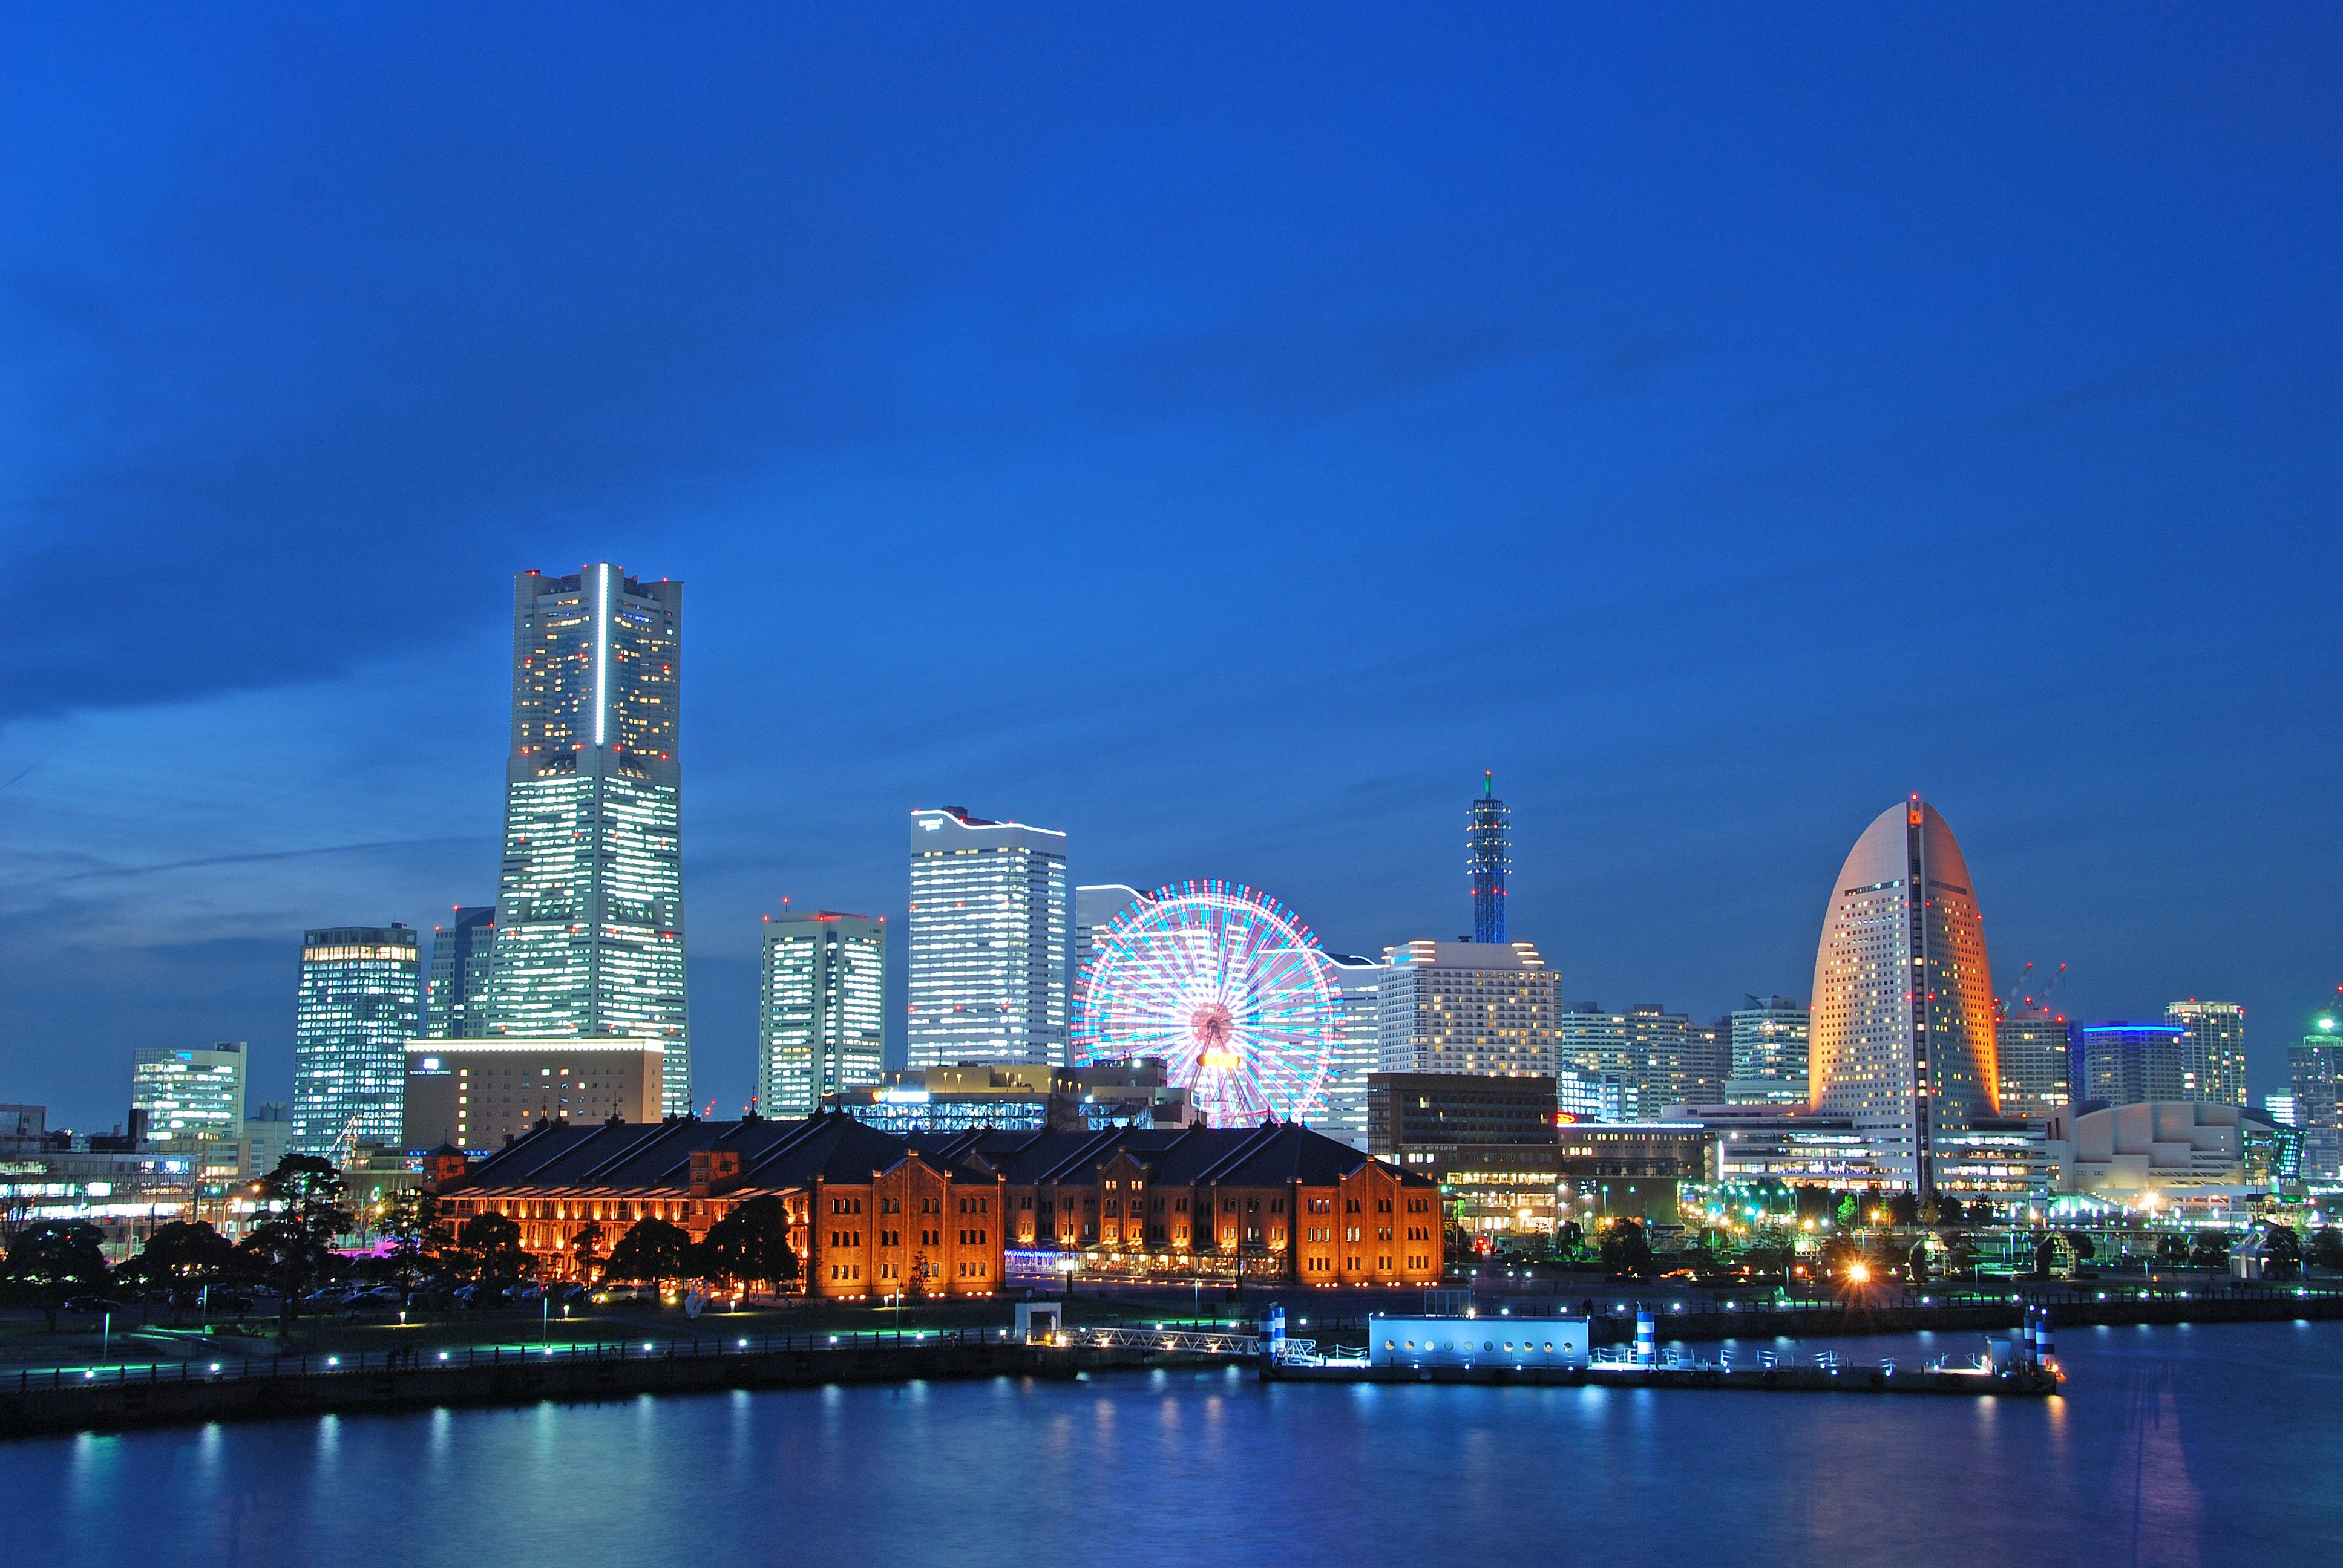 Minato_Mirai_In_Blue.jpg